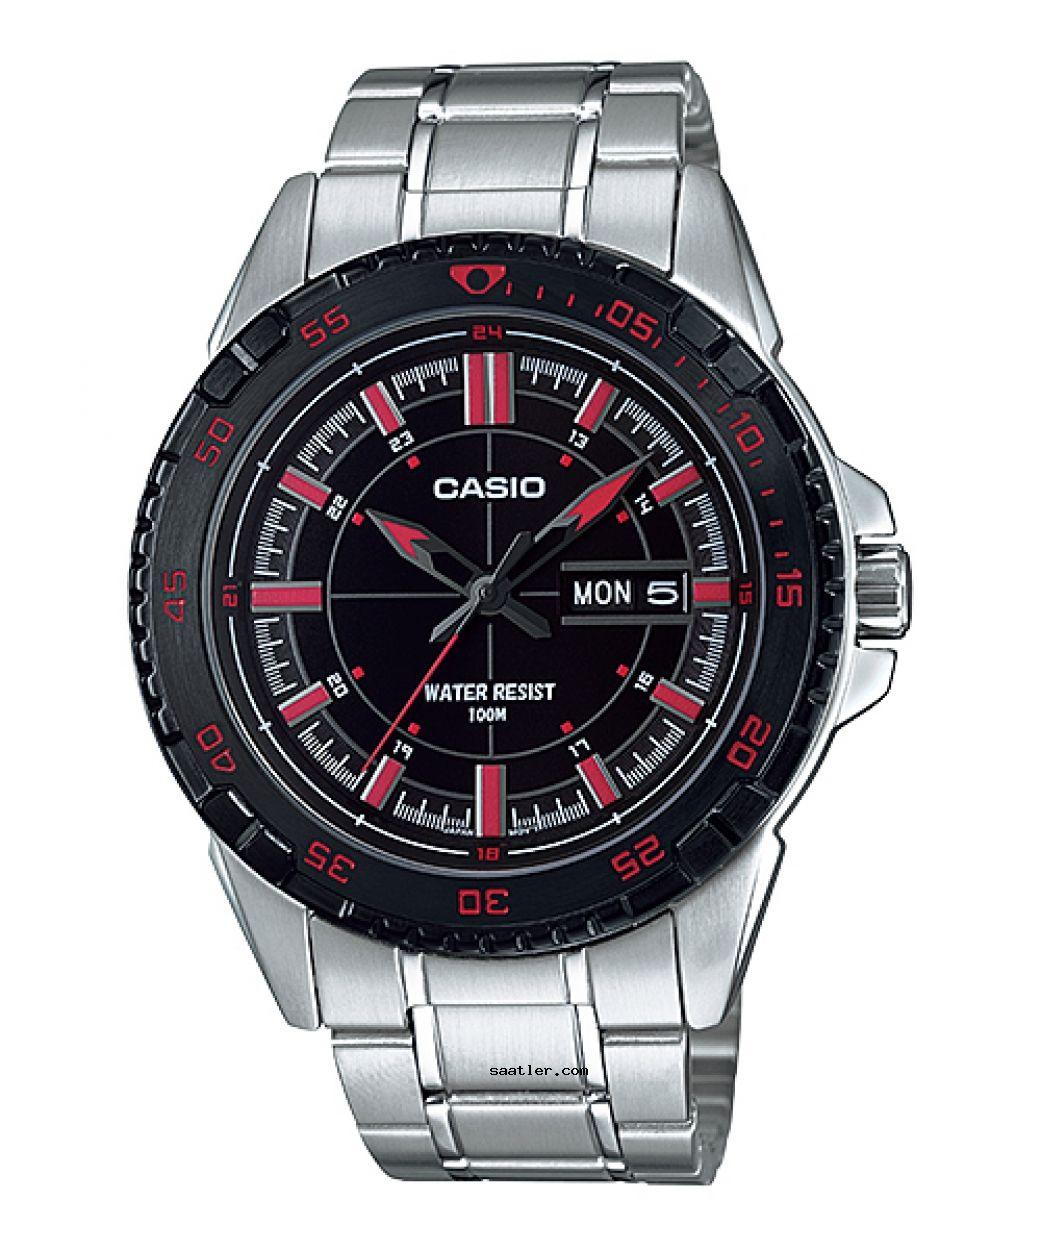 Casio Mtd1078d1a1vdf Kol Saati Erkek kol saatleri